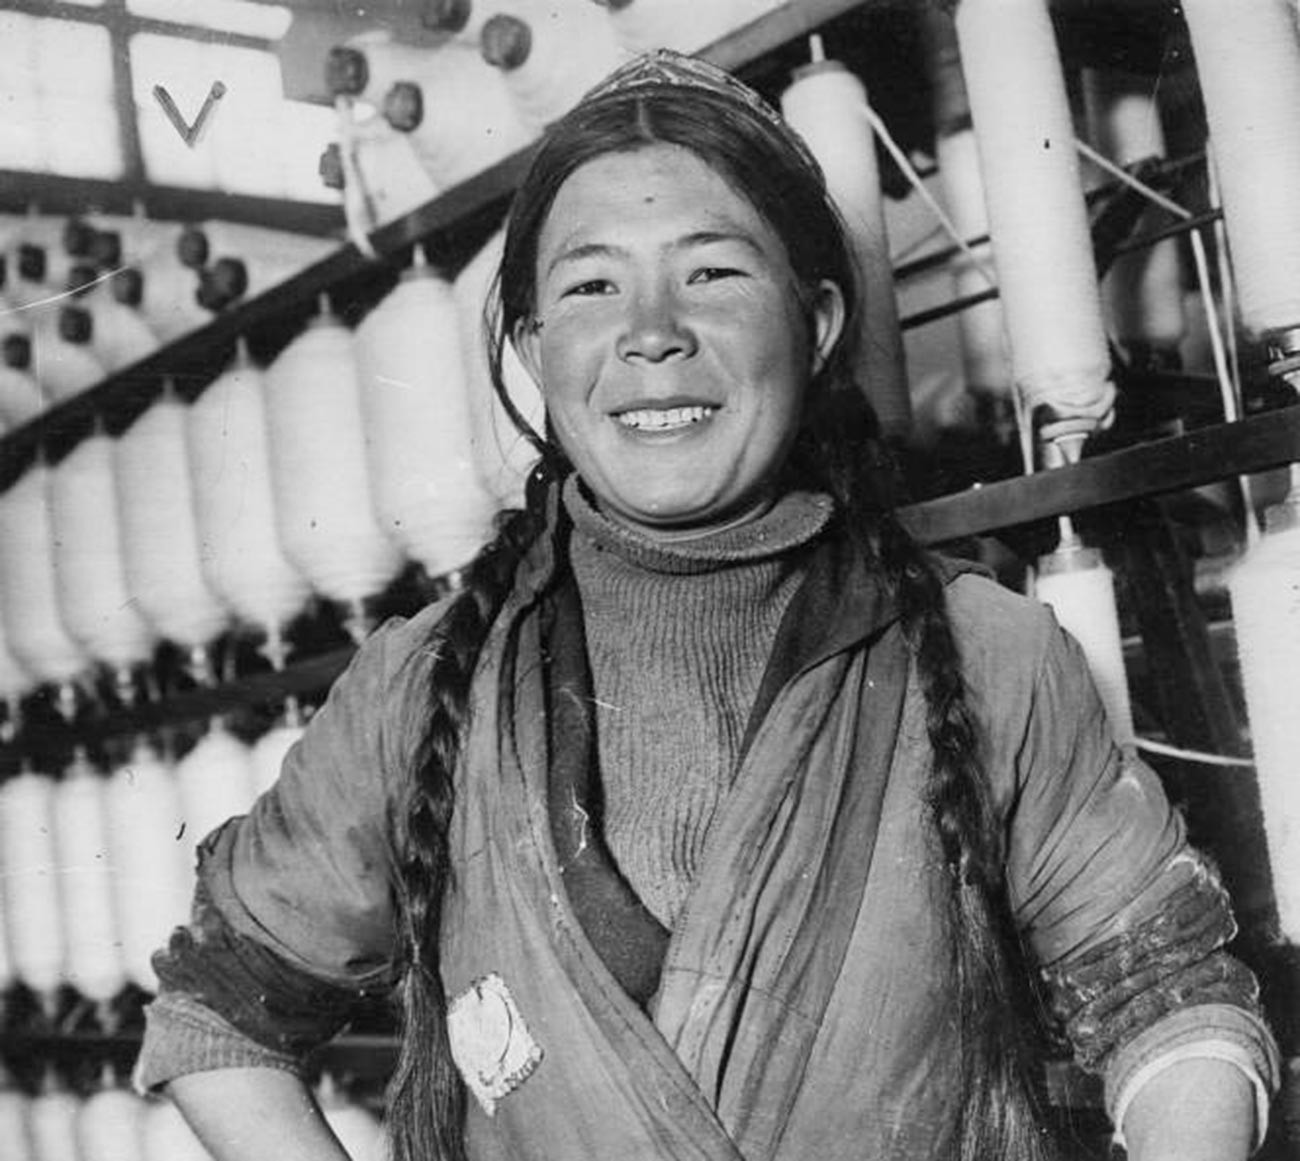 La stakhanoviste tadjike Guemouline Gueledjieva, 1936